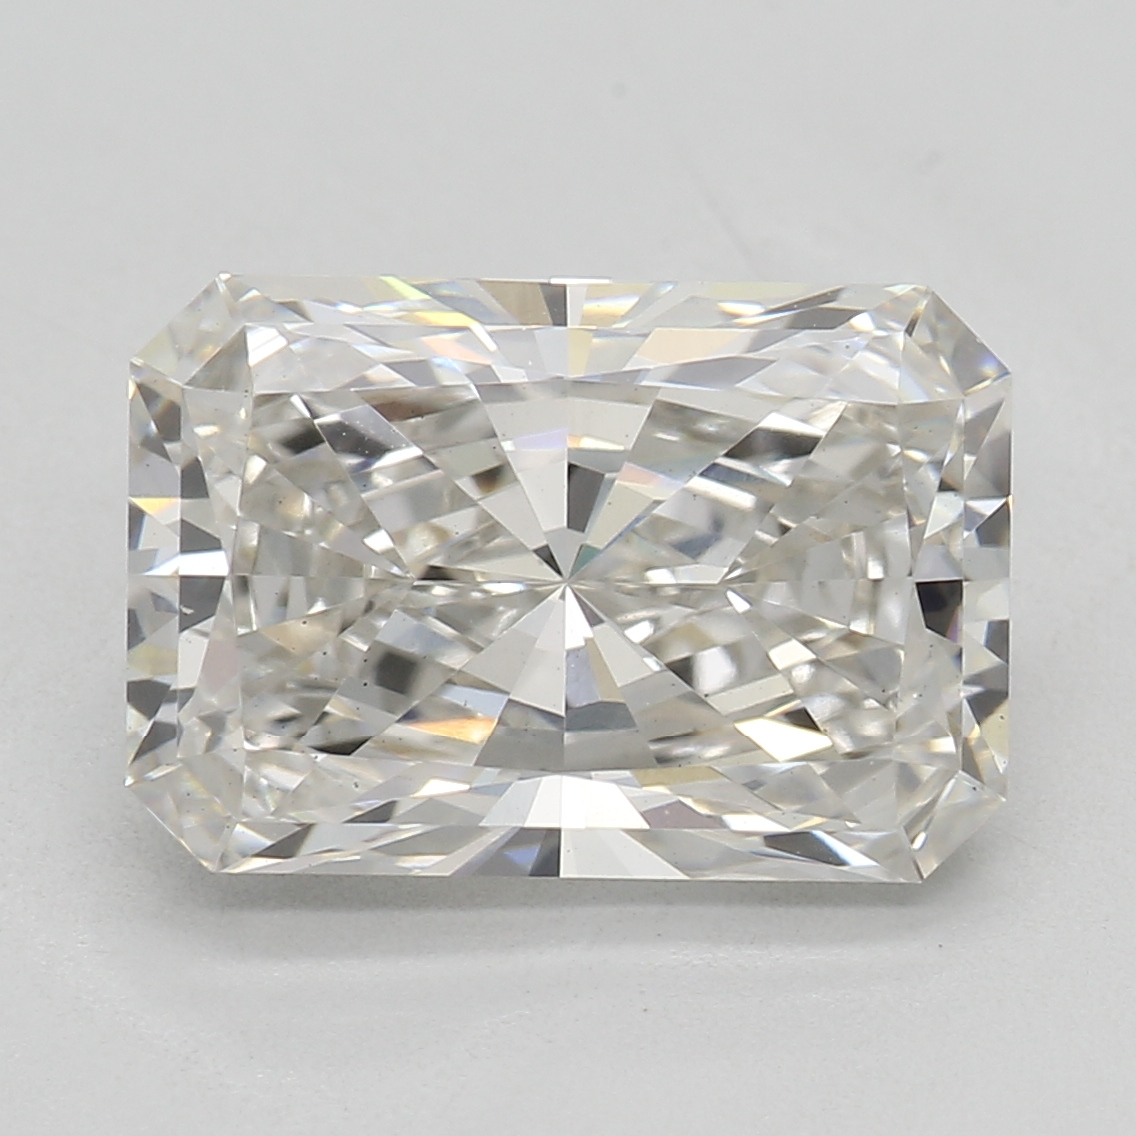 2.45 Carat H-VS1 Ideal Radiant Diamond